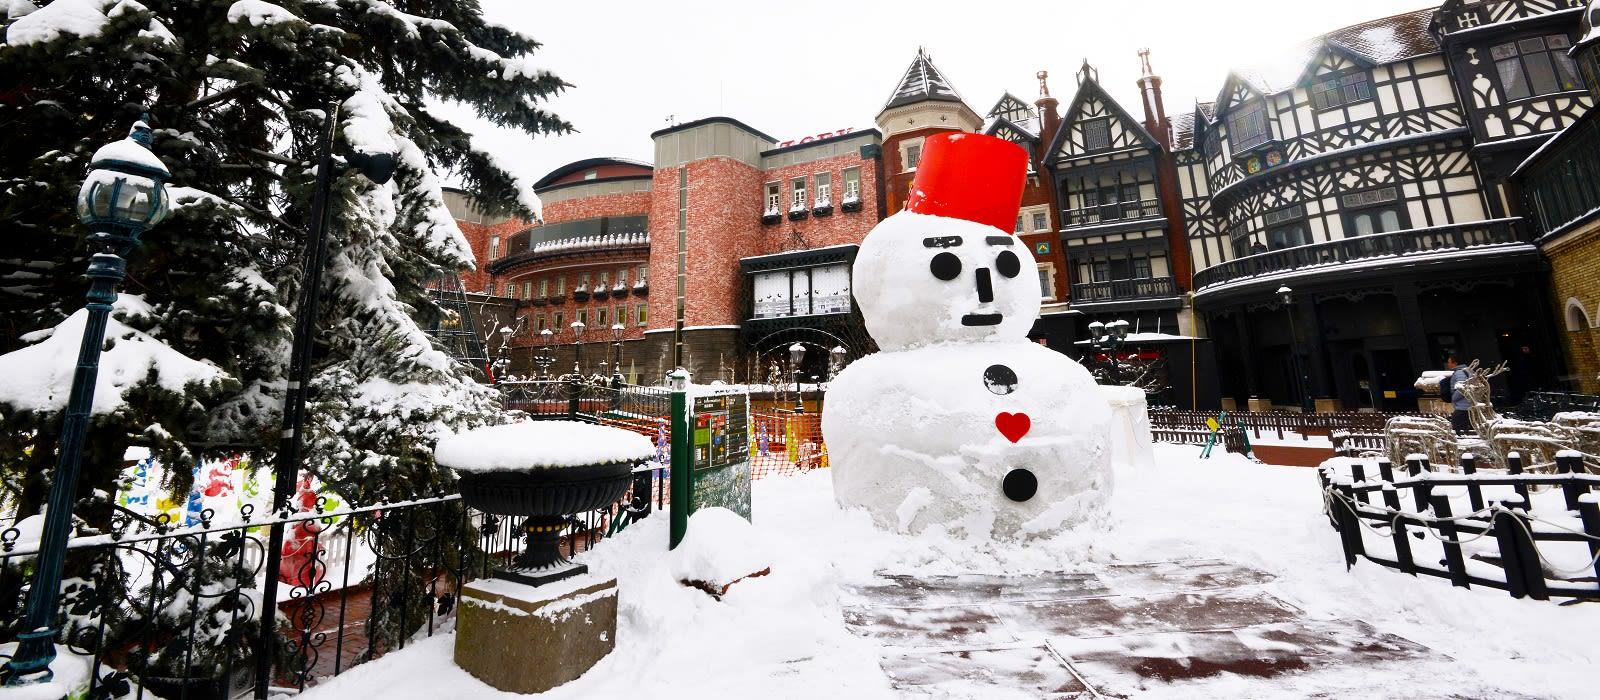 Destination Sapporo Japan